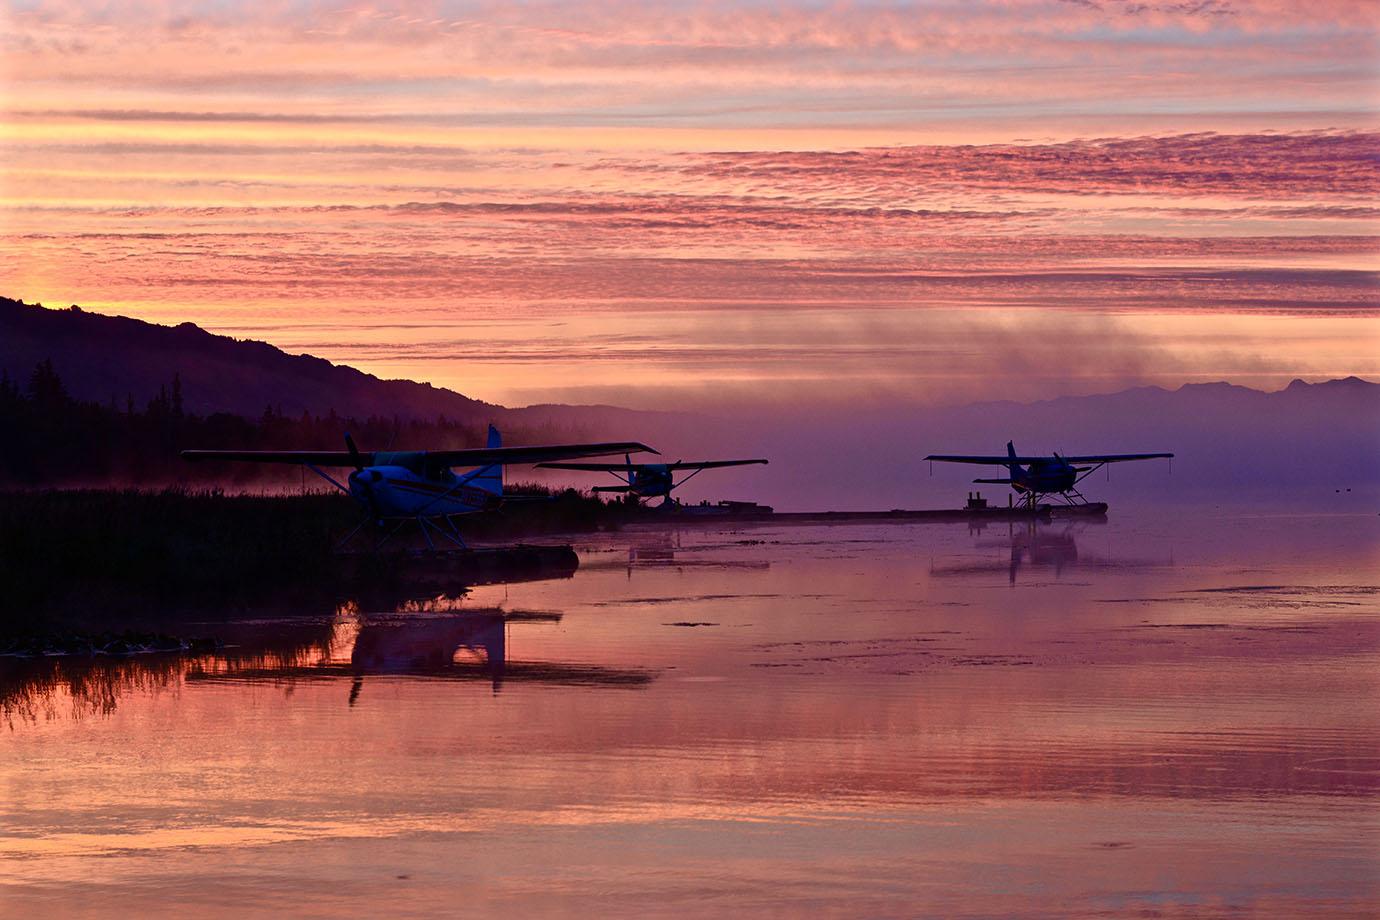 Seaplanes at sunrise